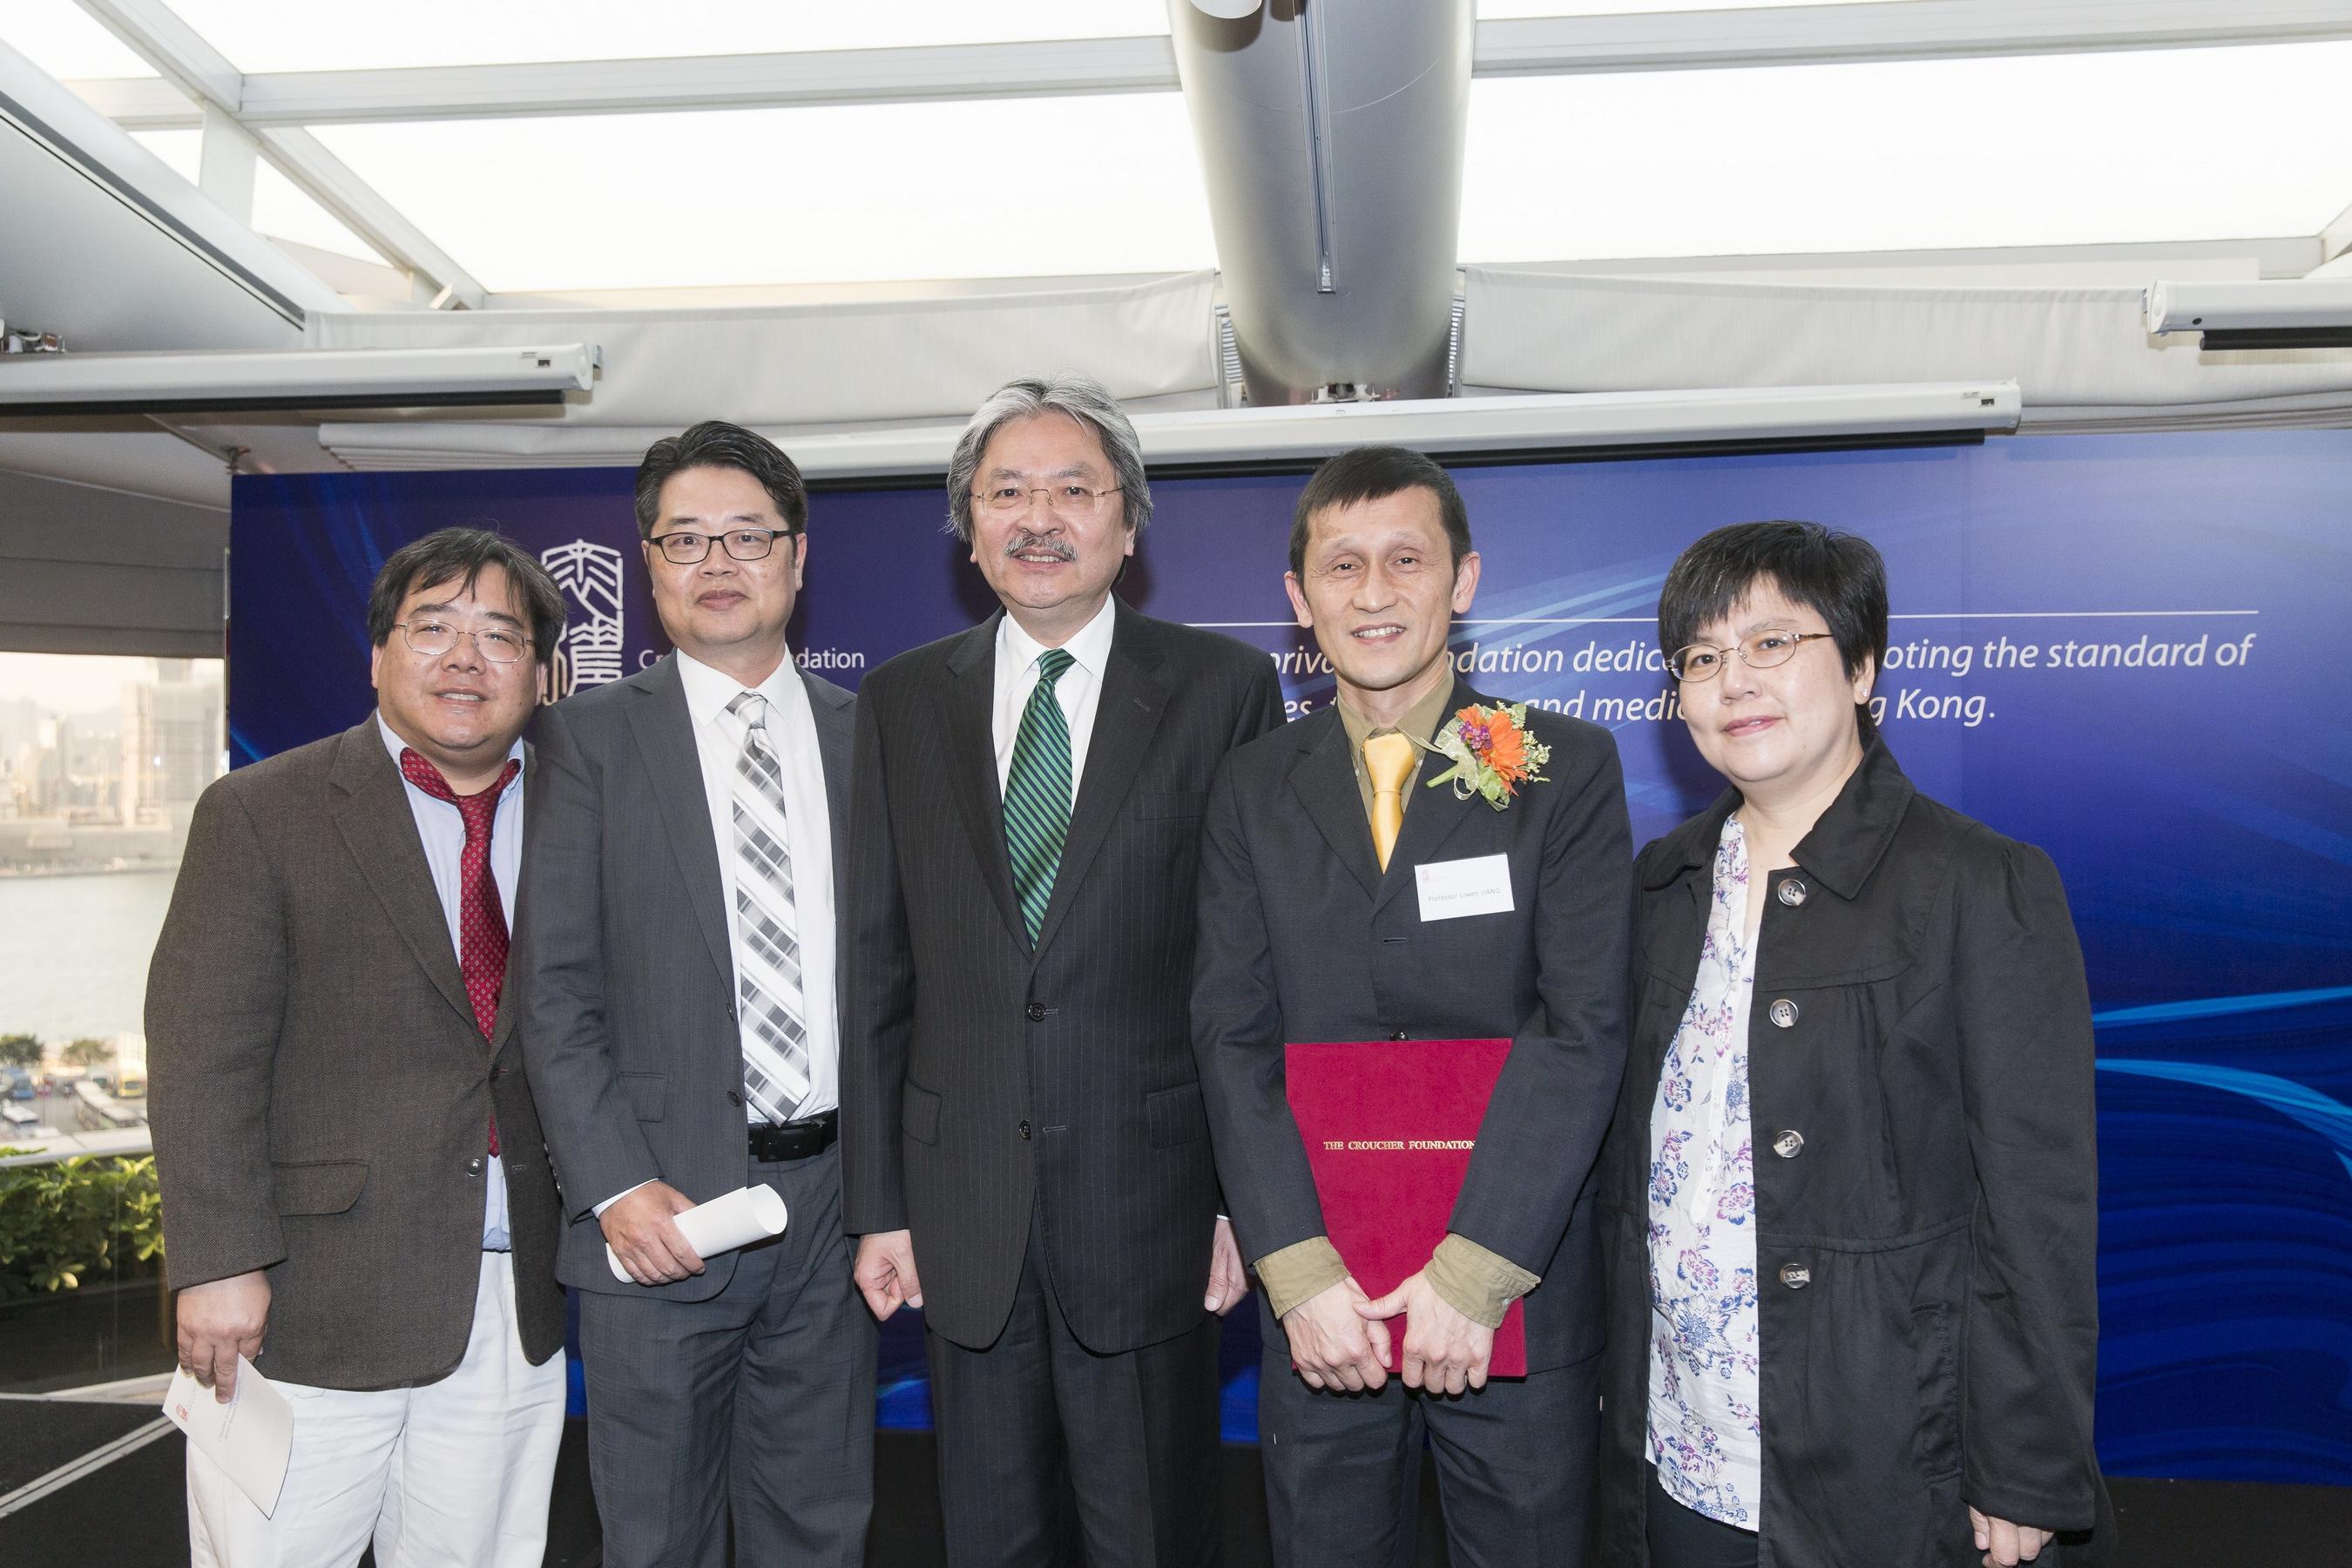 A group photo of Mr John Tsang Chun-wah and CUHK members.